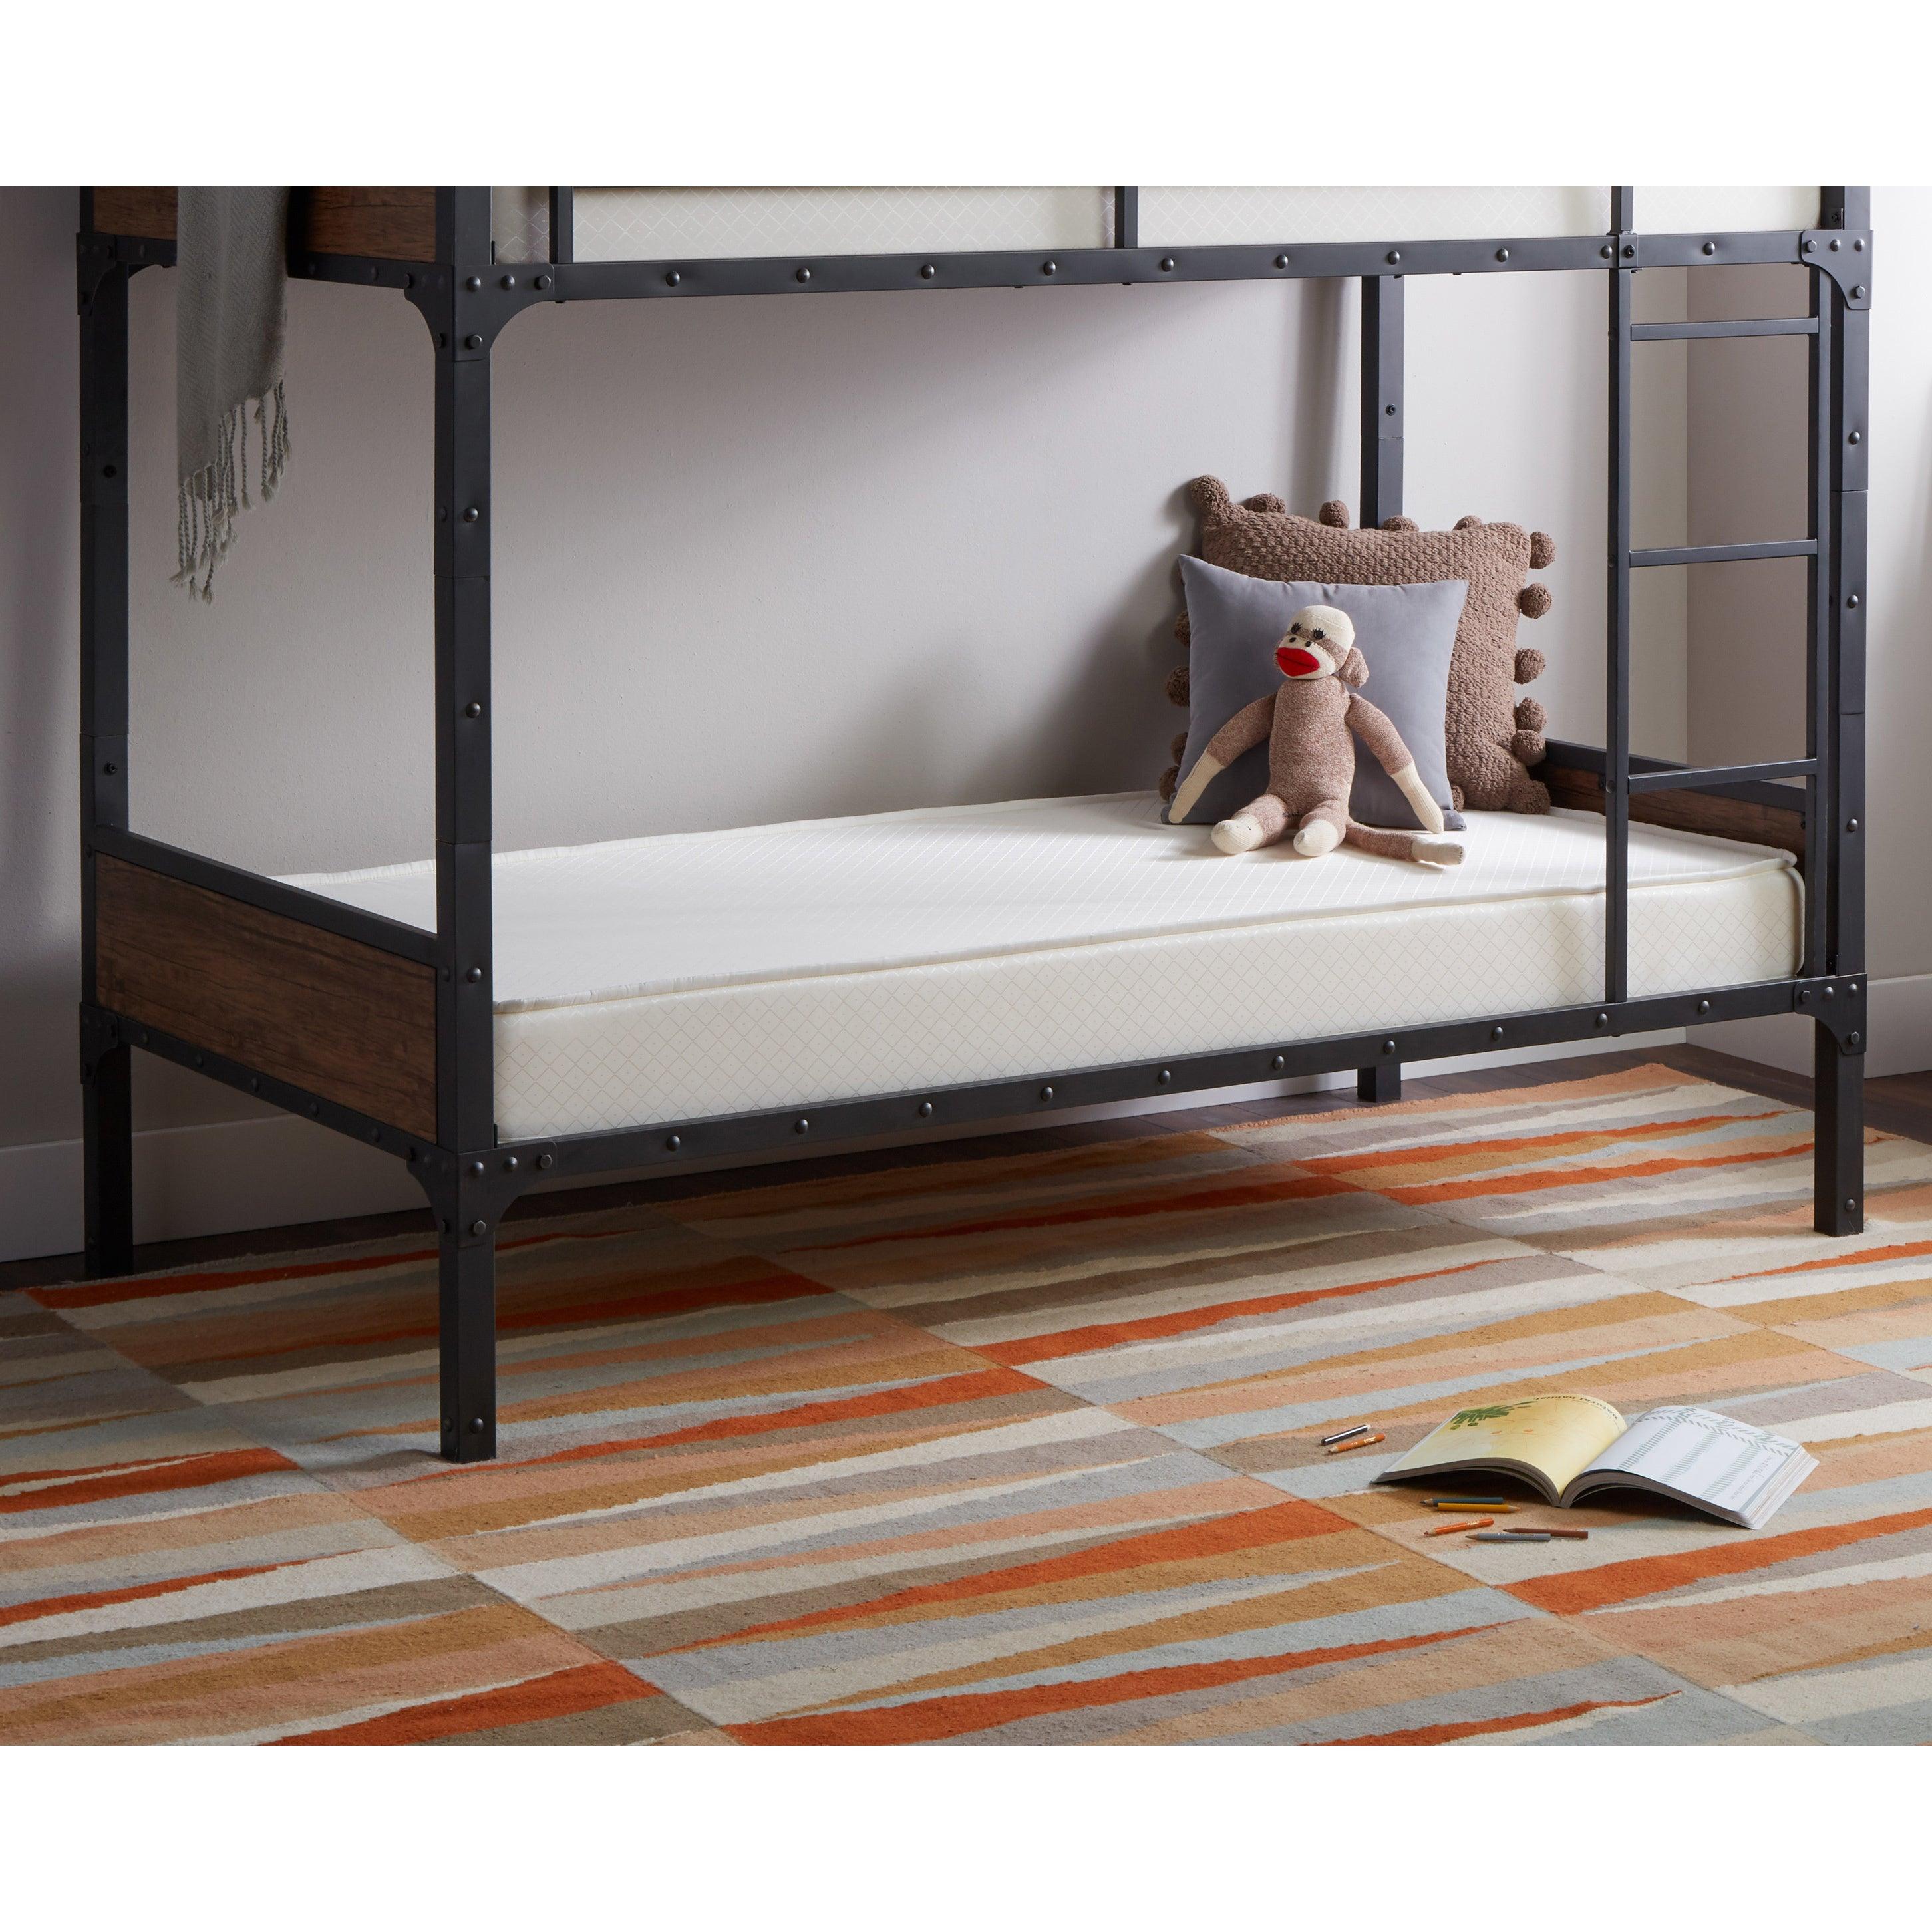 Shop Select Luxury Flippable 6 inch Twin size Foam Mattress (Pack